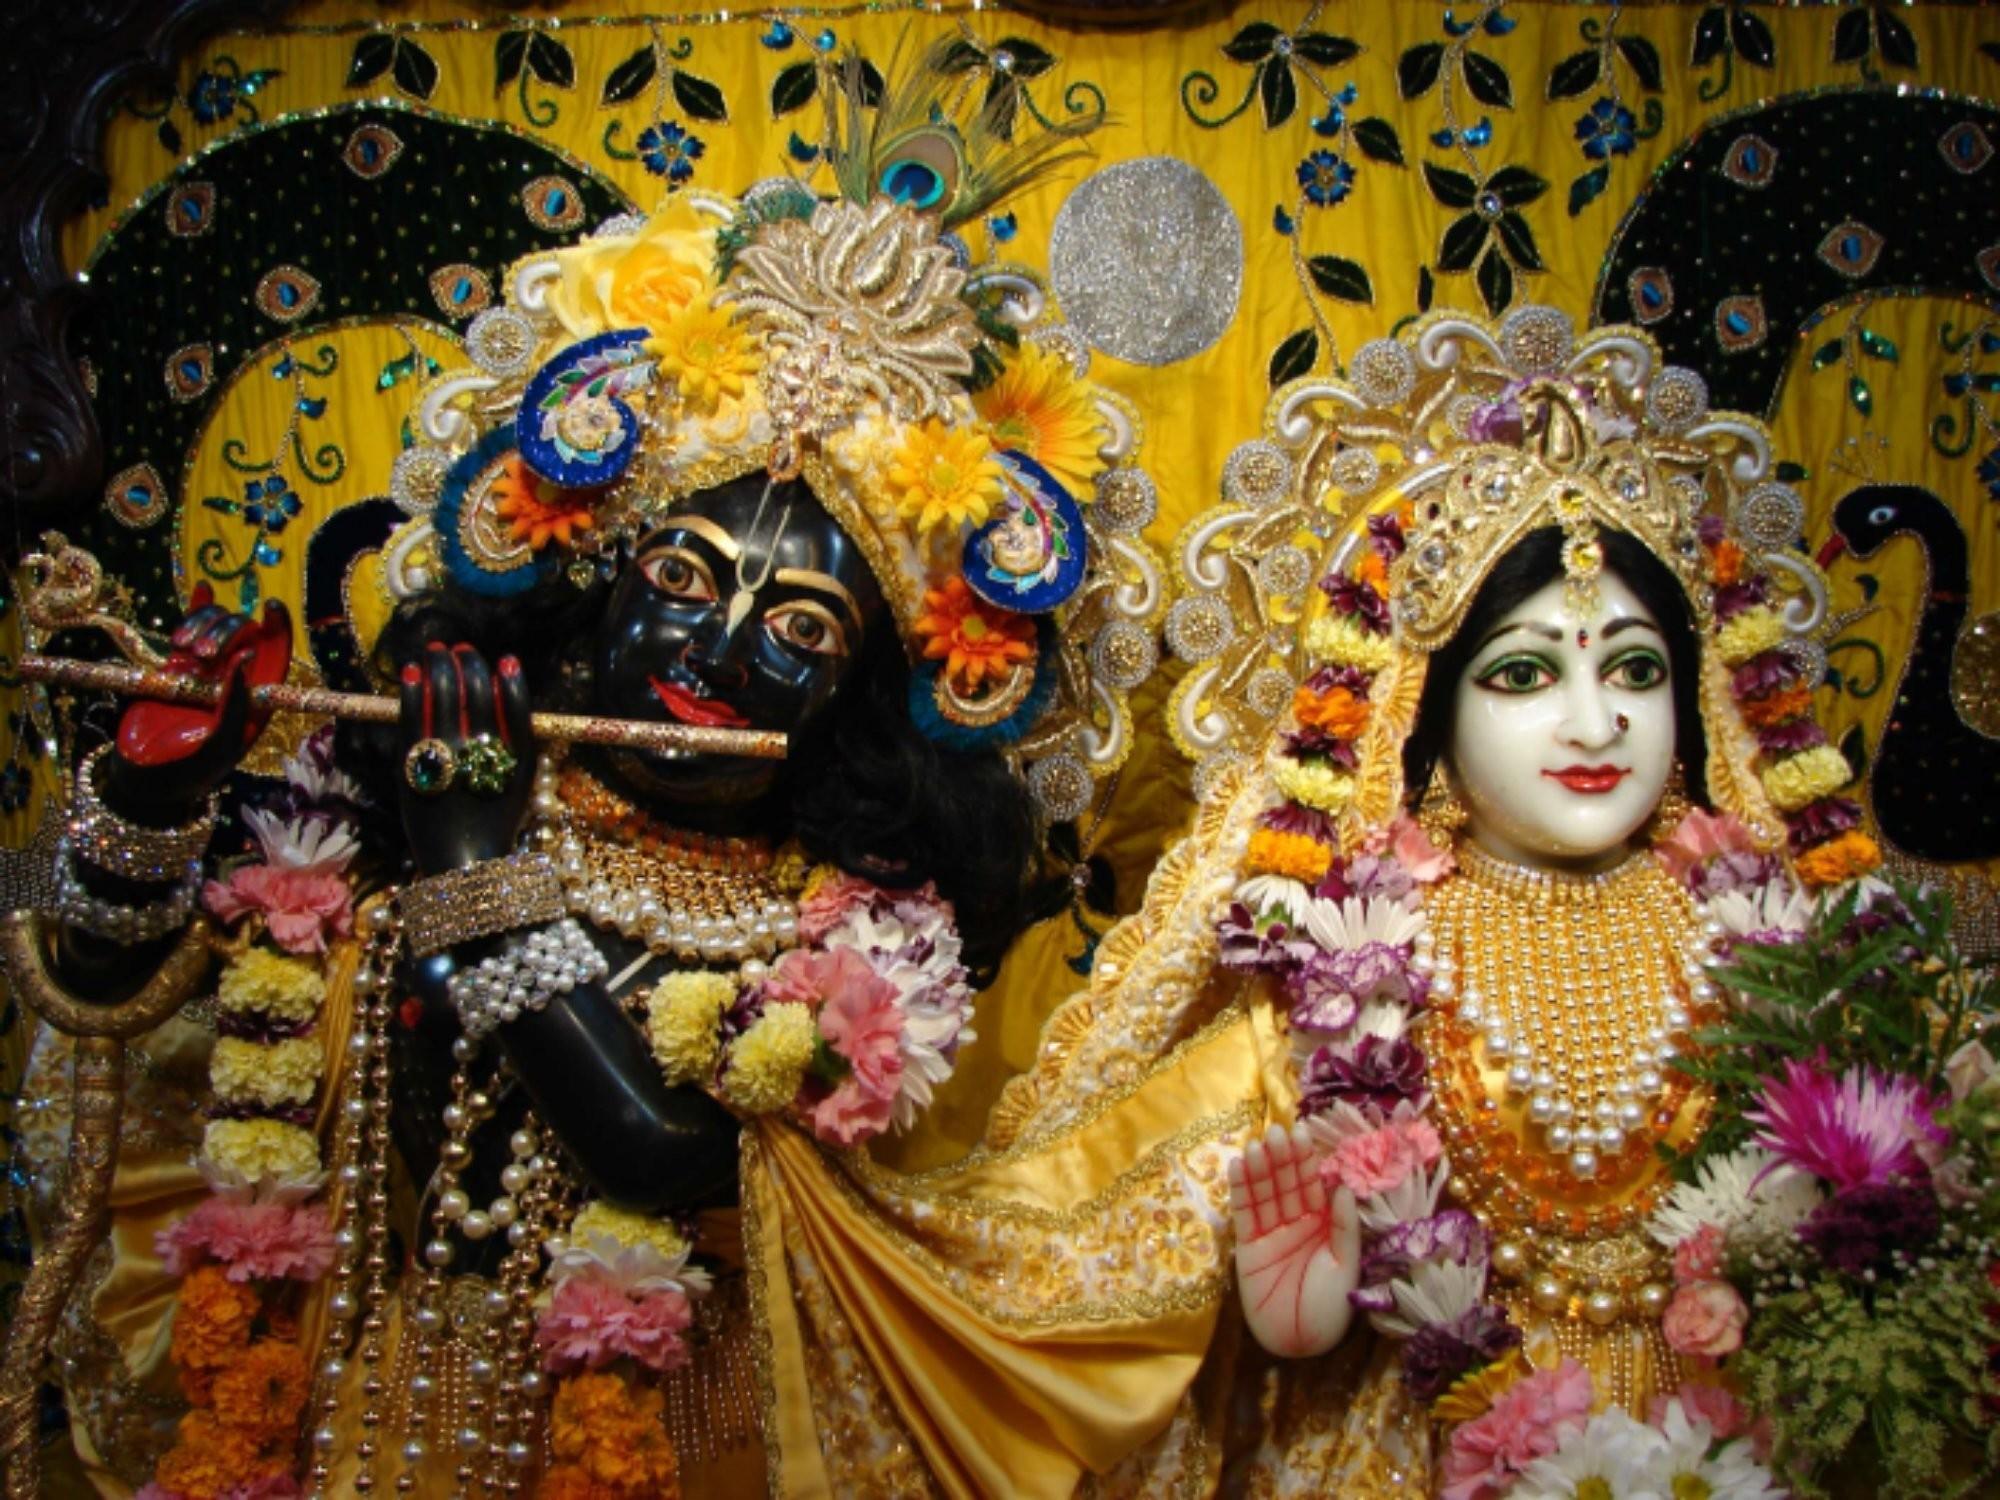 Free wallpapers of Lord Krishna for desktop49